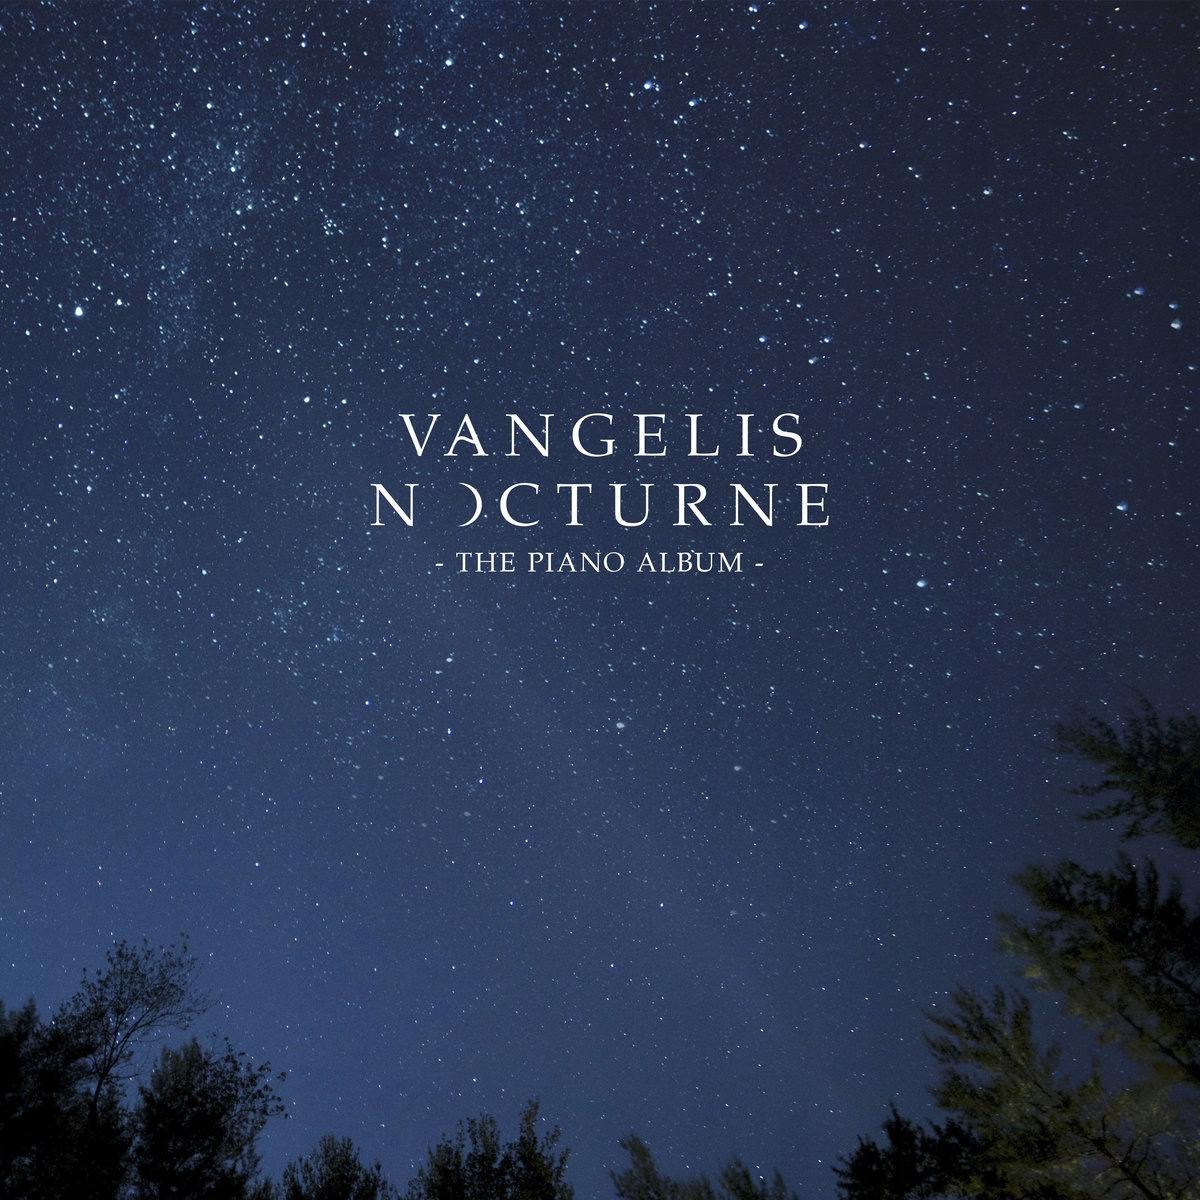 ВАНГЕЛИС Nocturne. The Piano Album 2LP доставка товаров из Польши и Allegro на русском